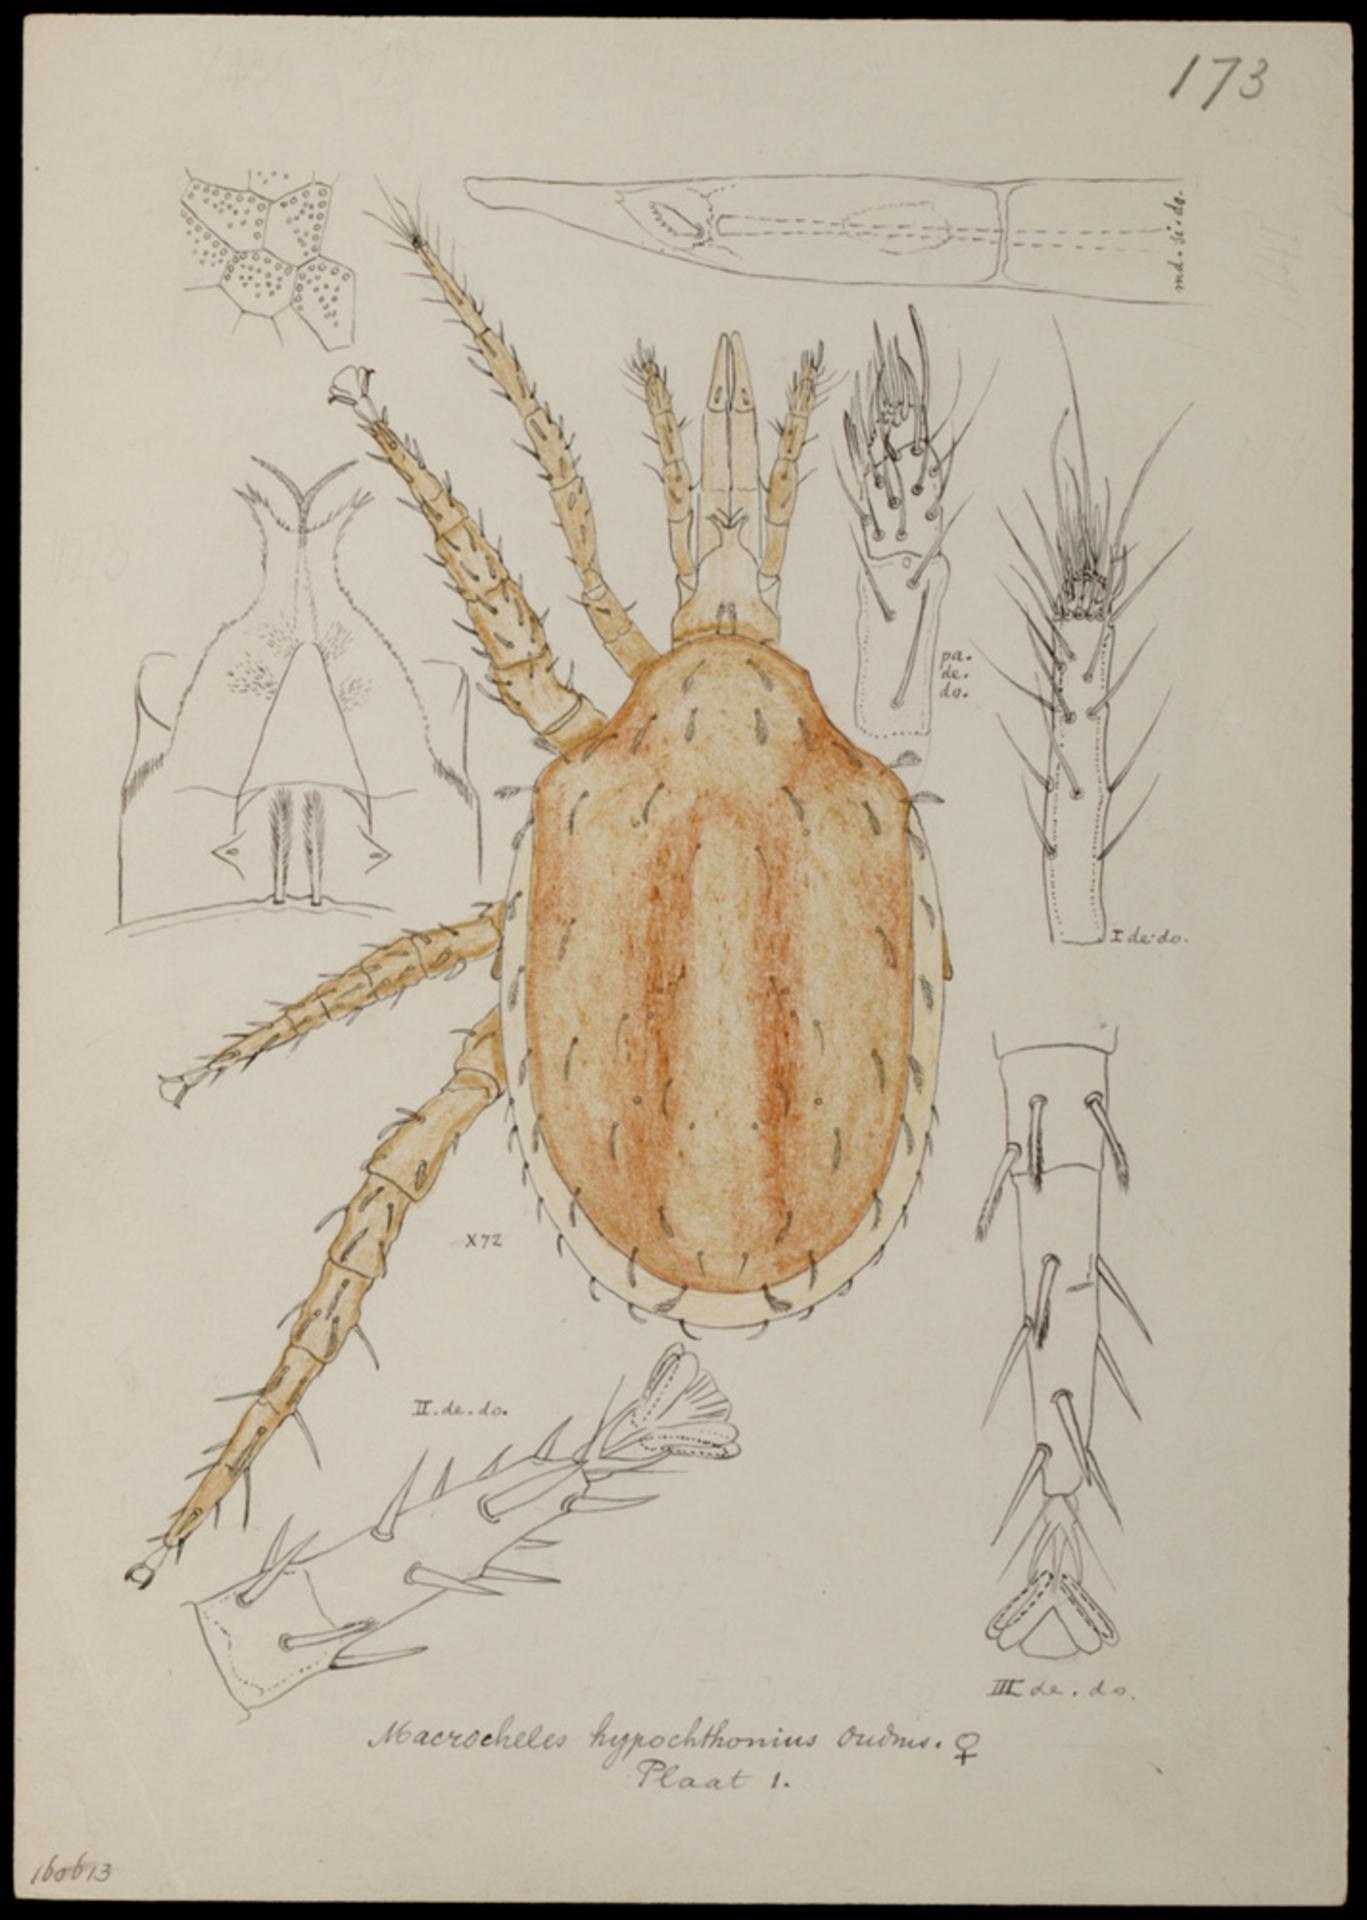 RMNH.ART.1033 | Macrocheles hypochthonius (Oudmans)